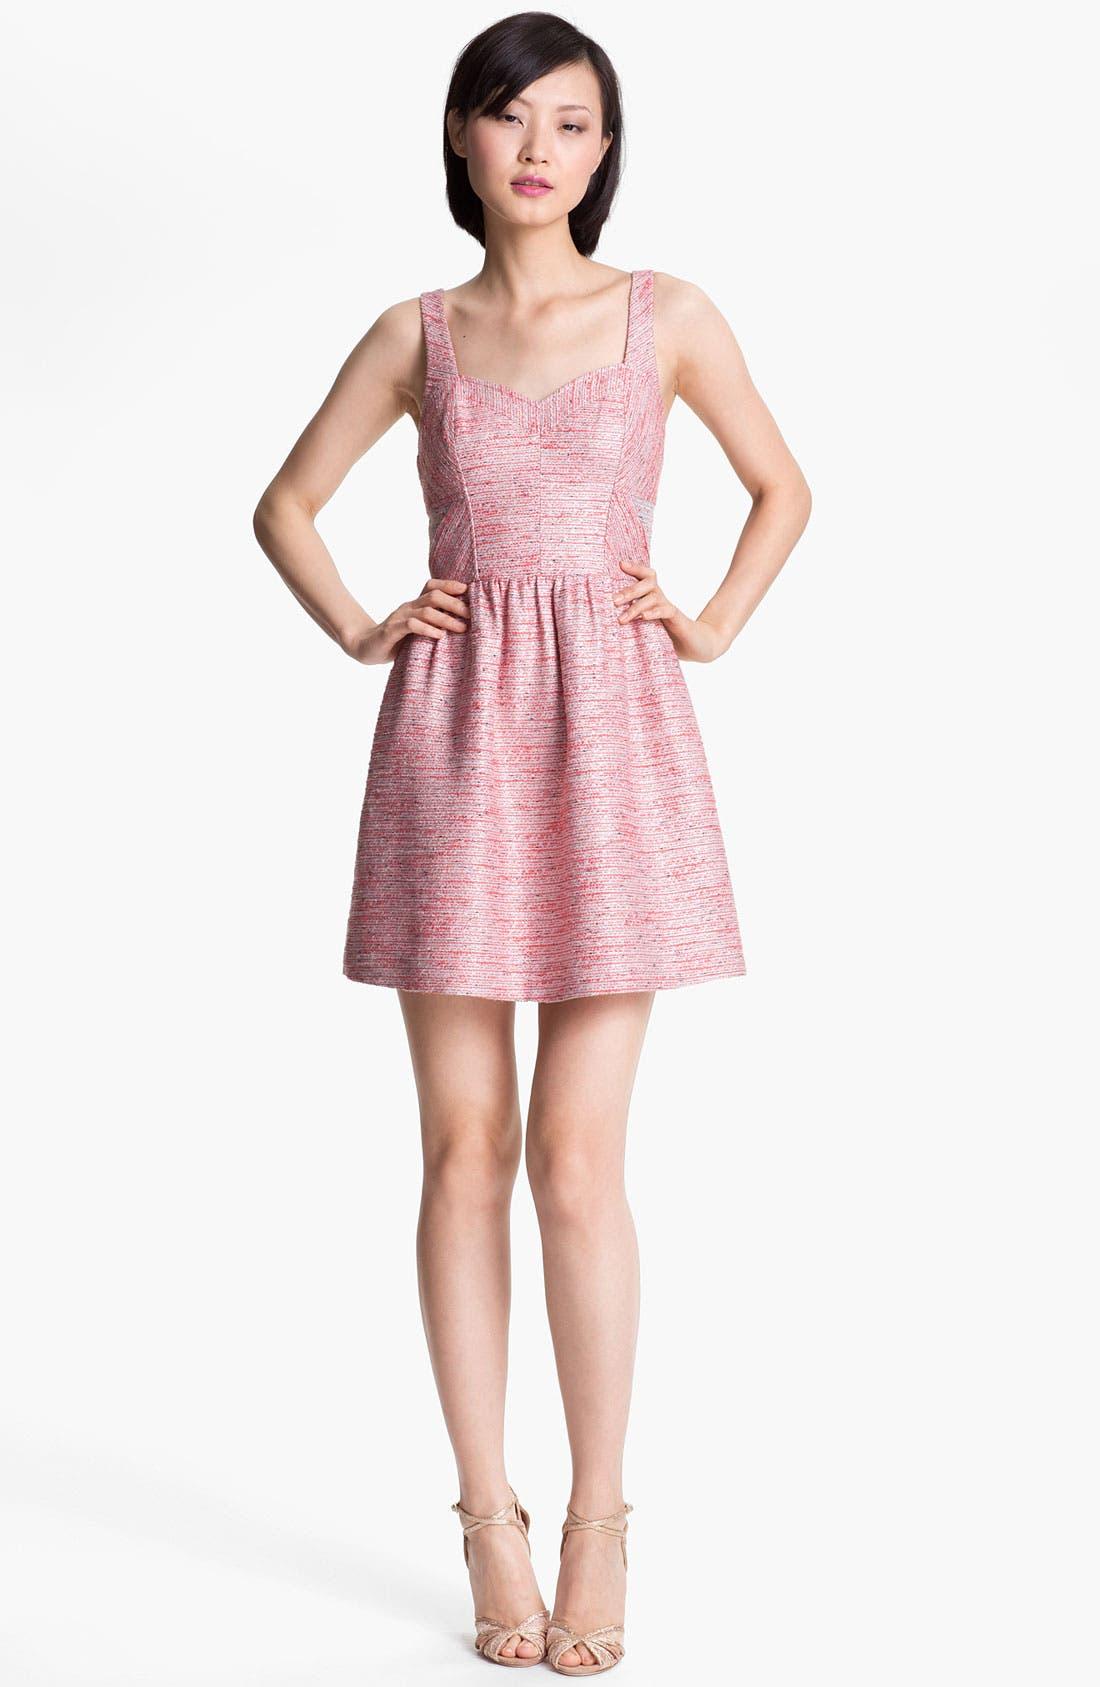 Main Image - Mcginn Dress & Accessories